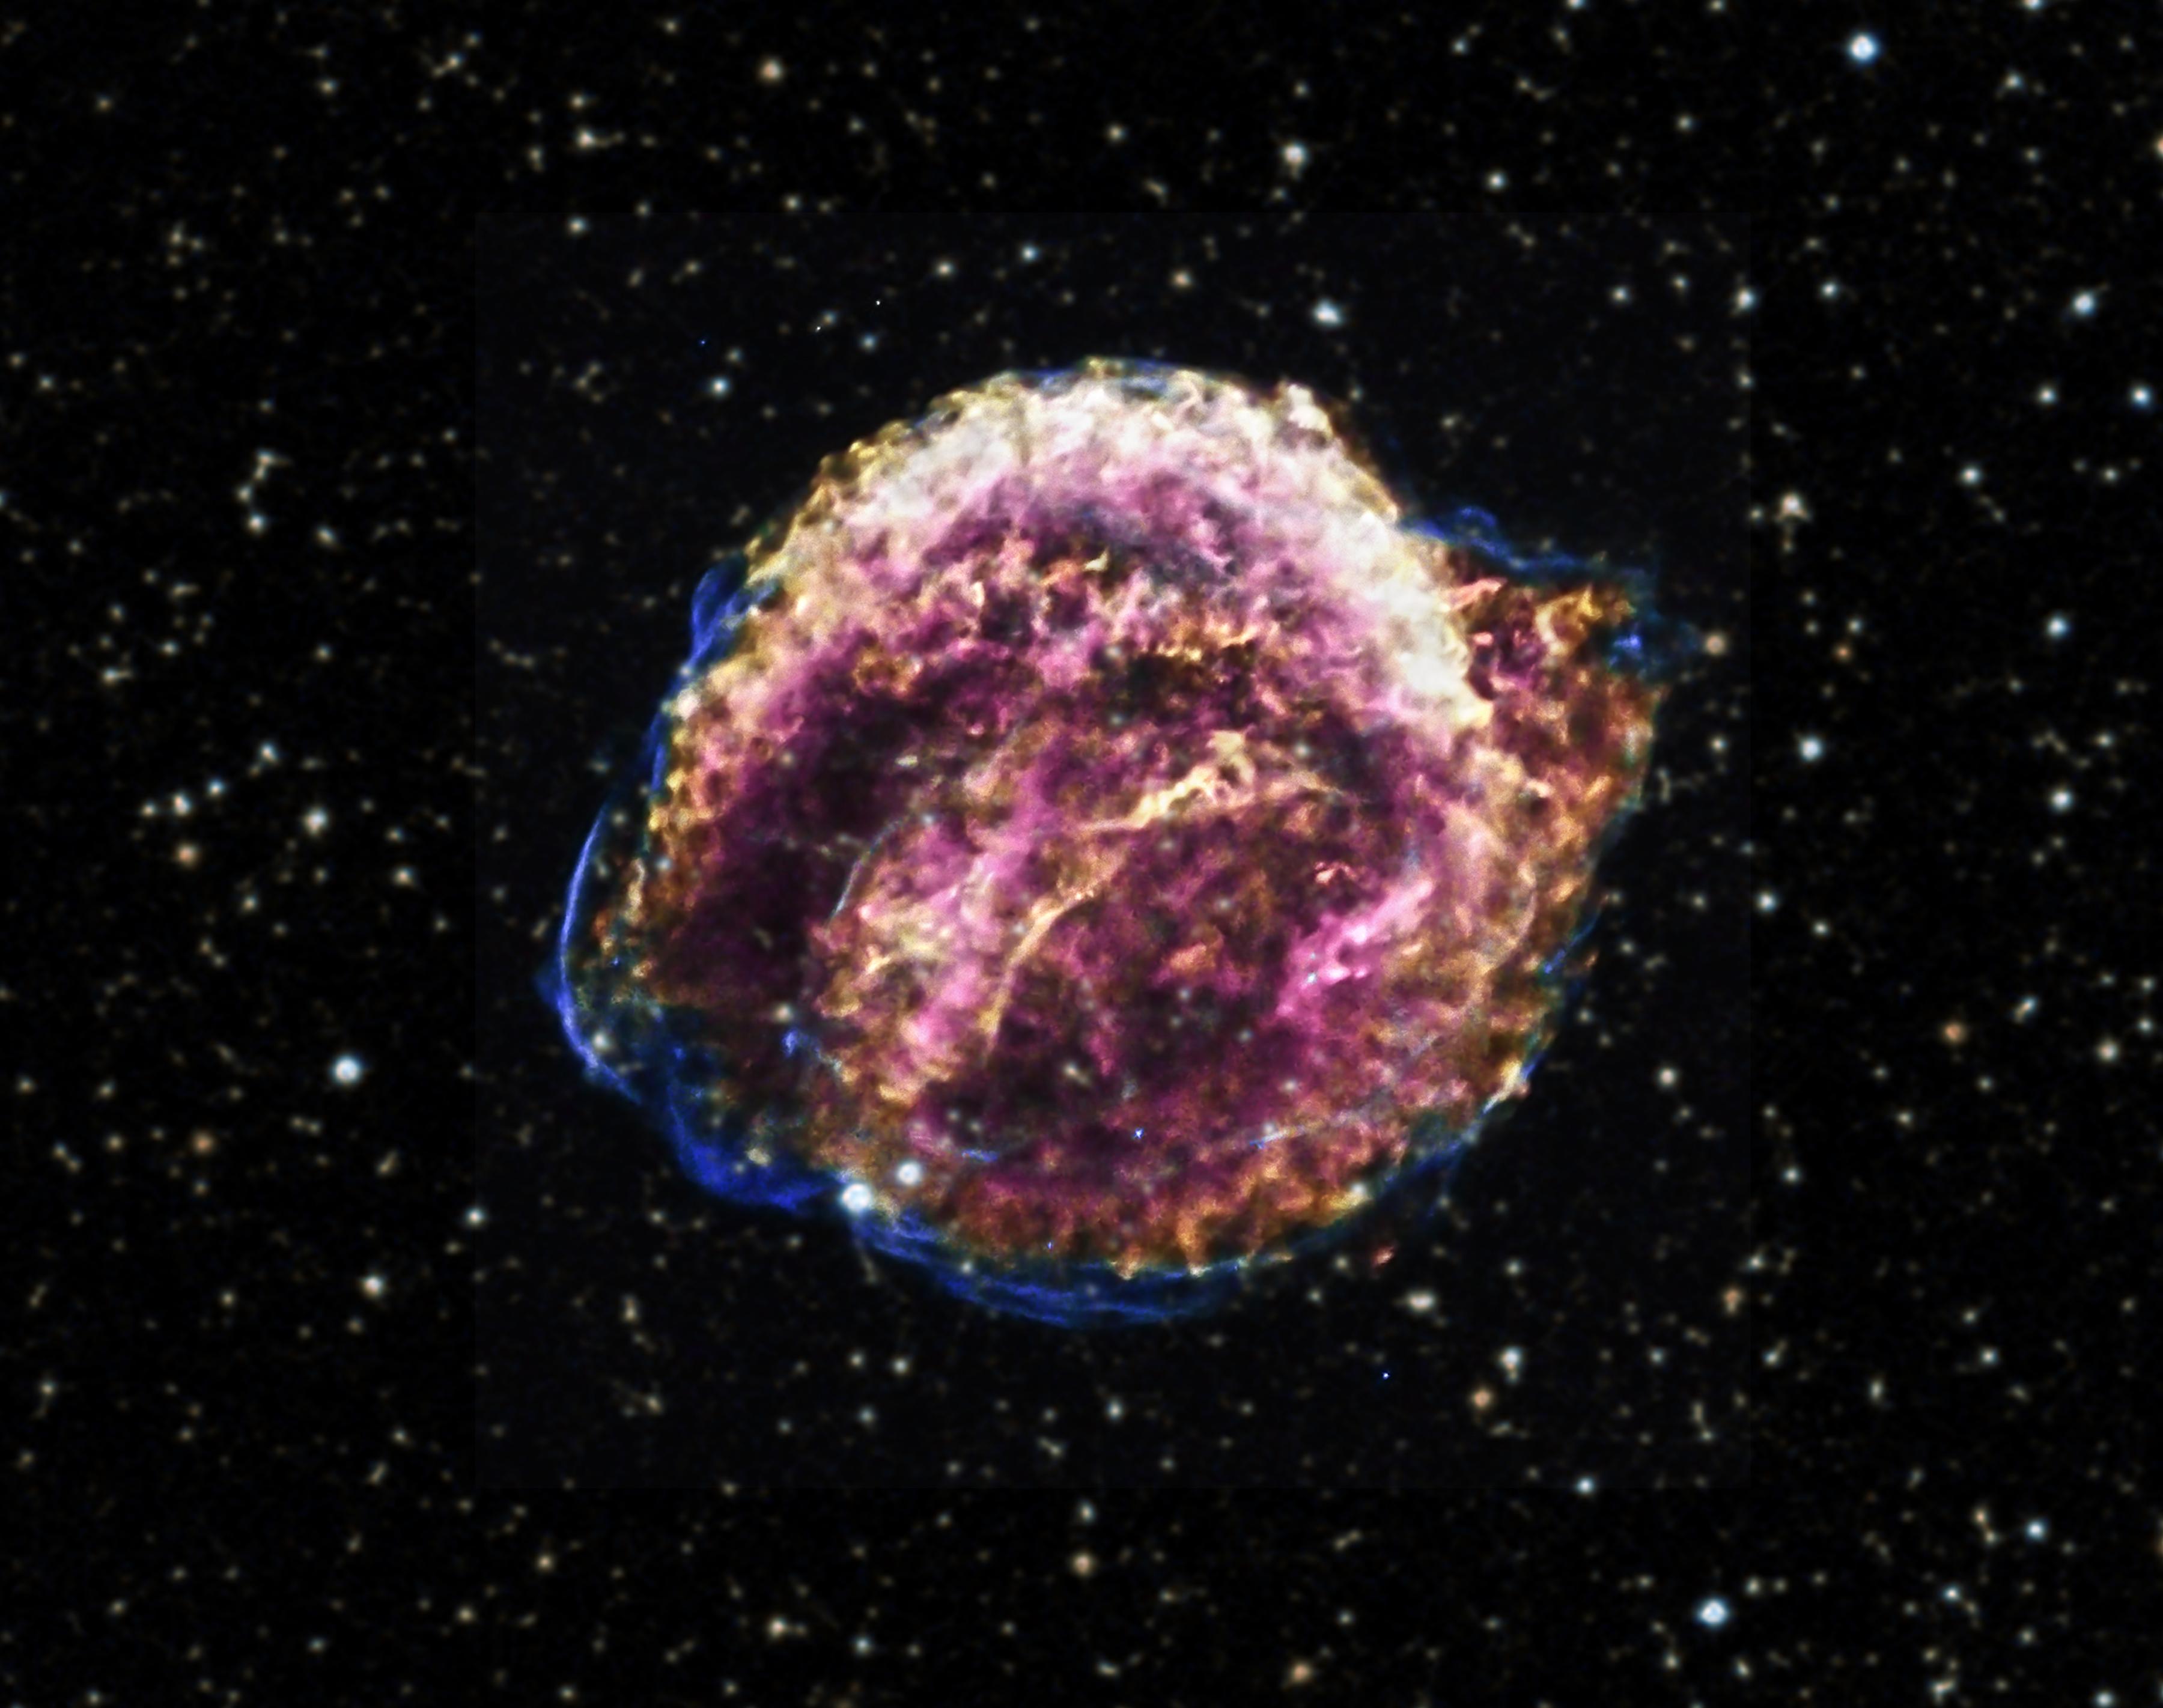 supernova in the night sky - photo #32